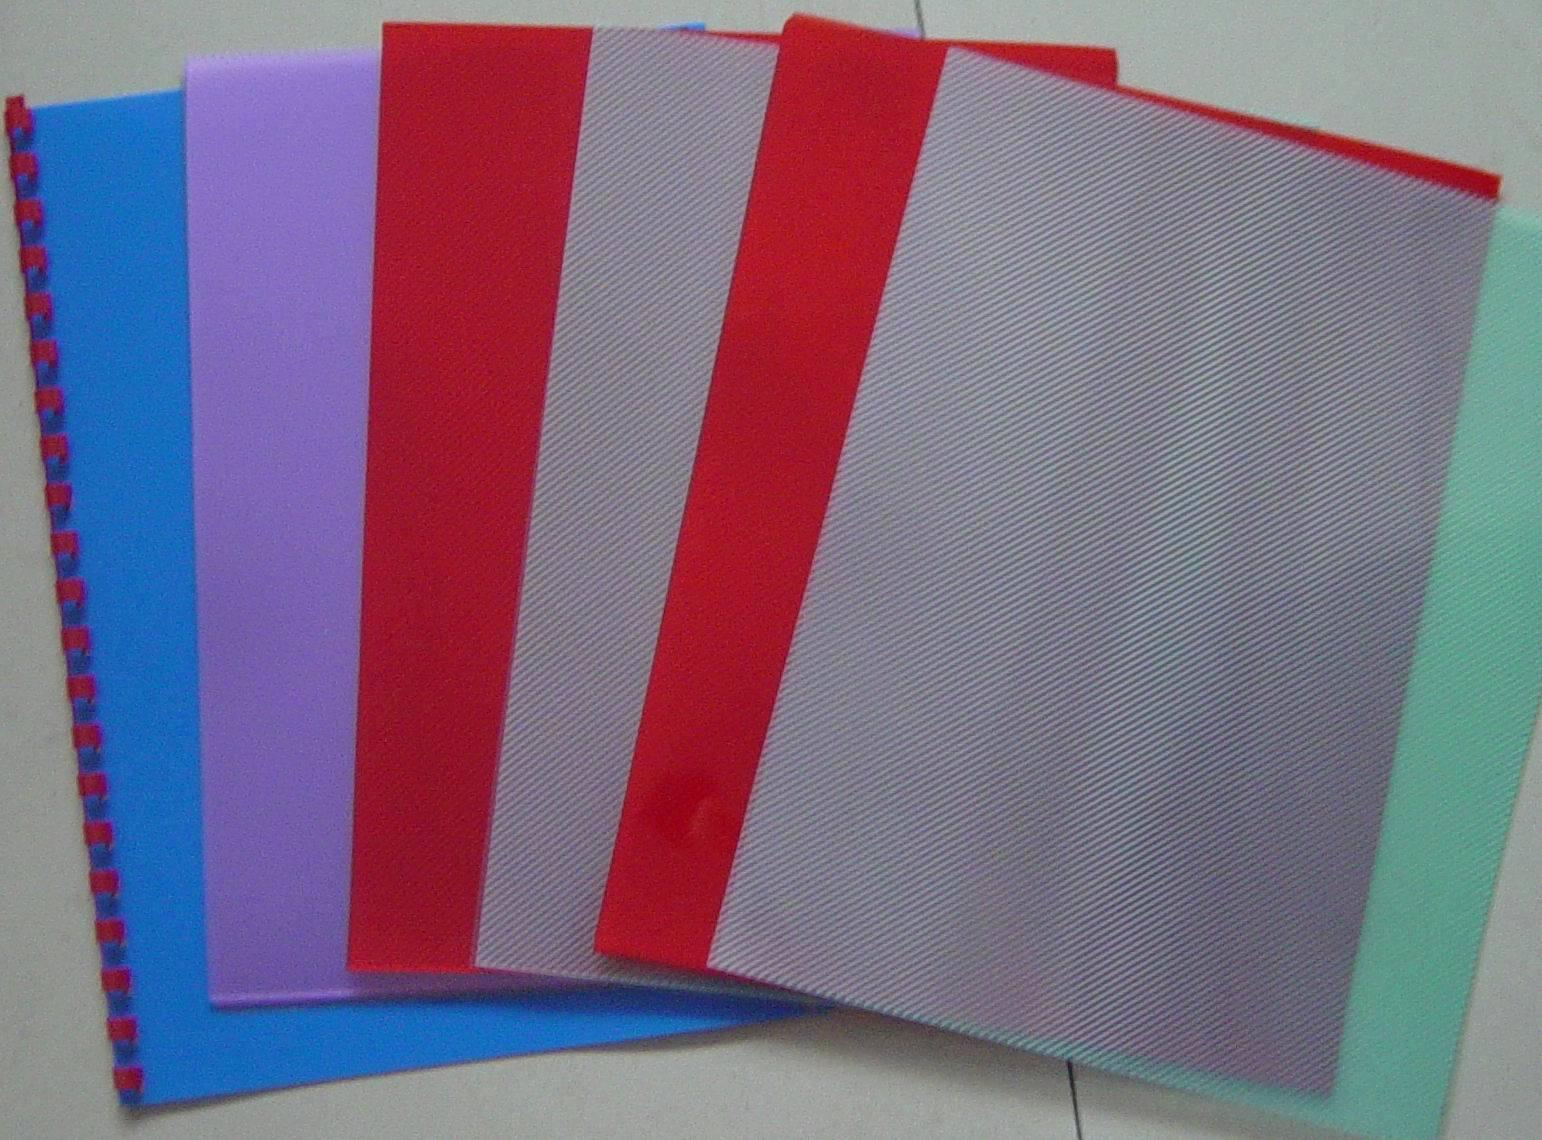 PP Binding Cover